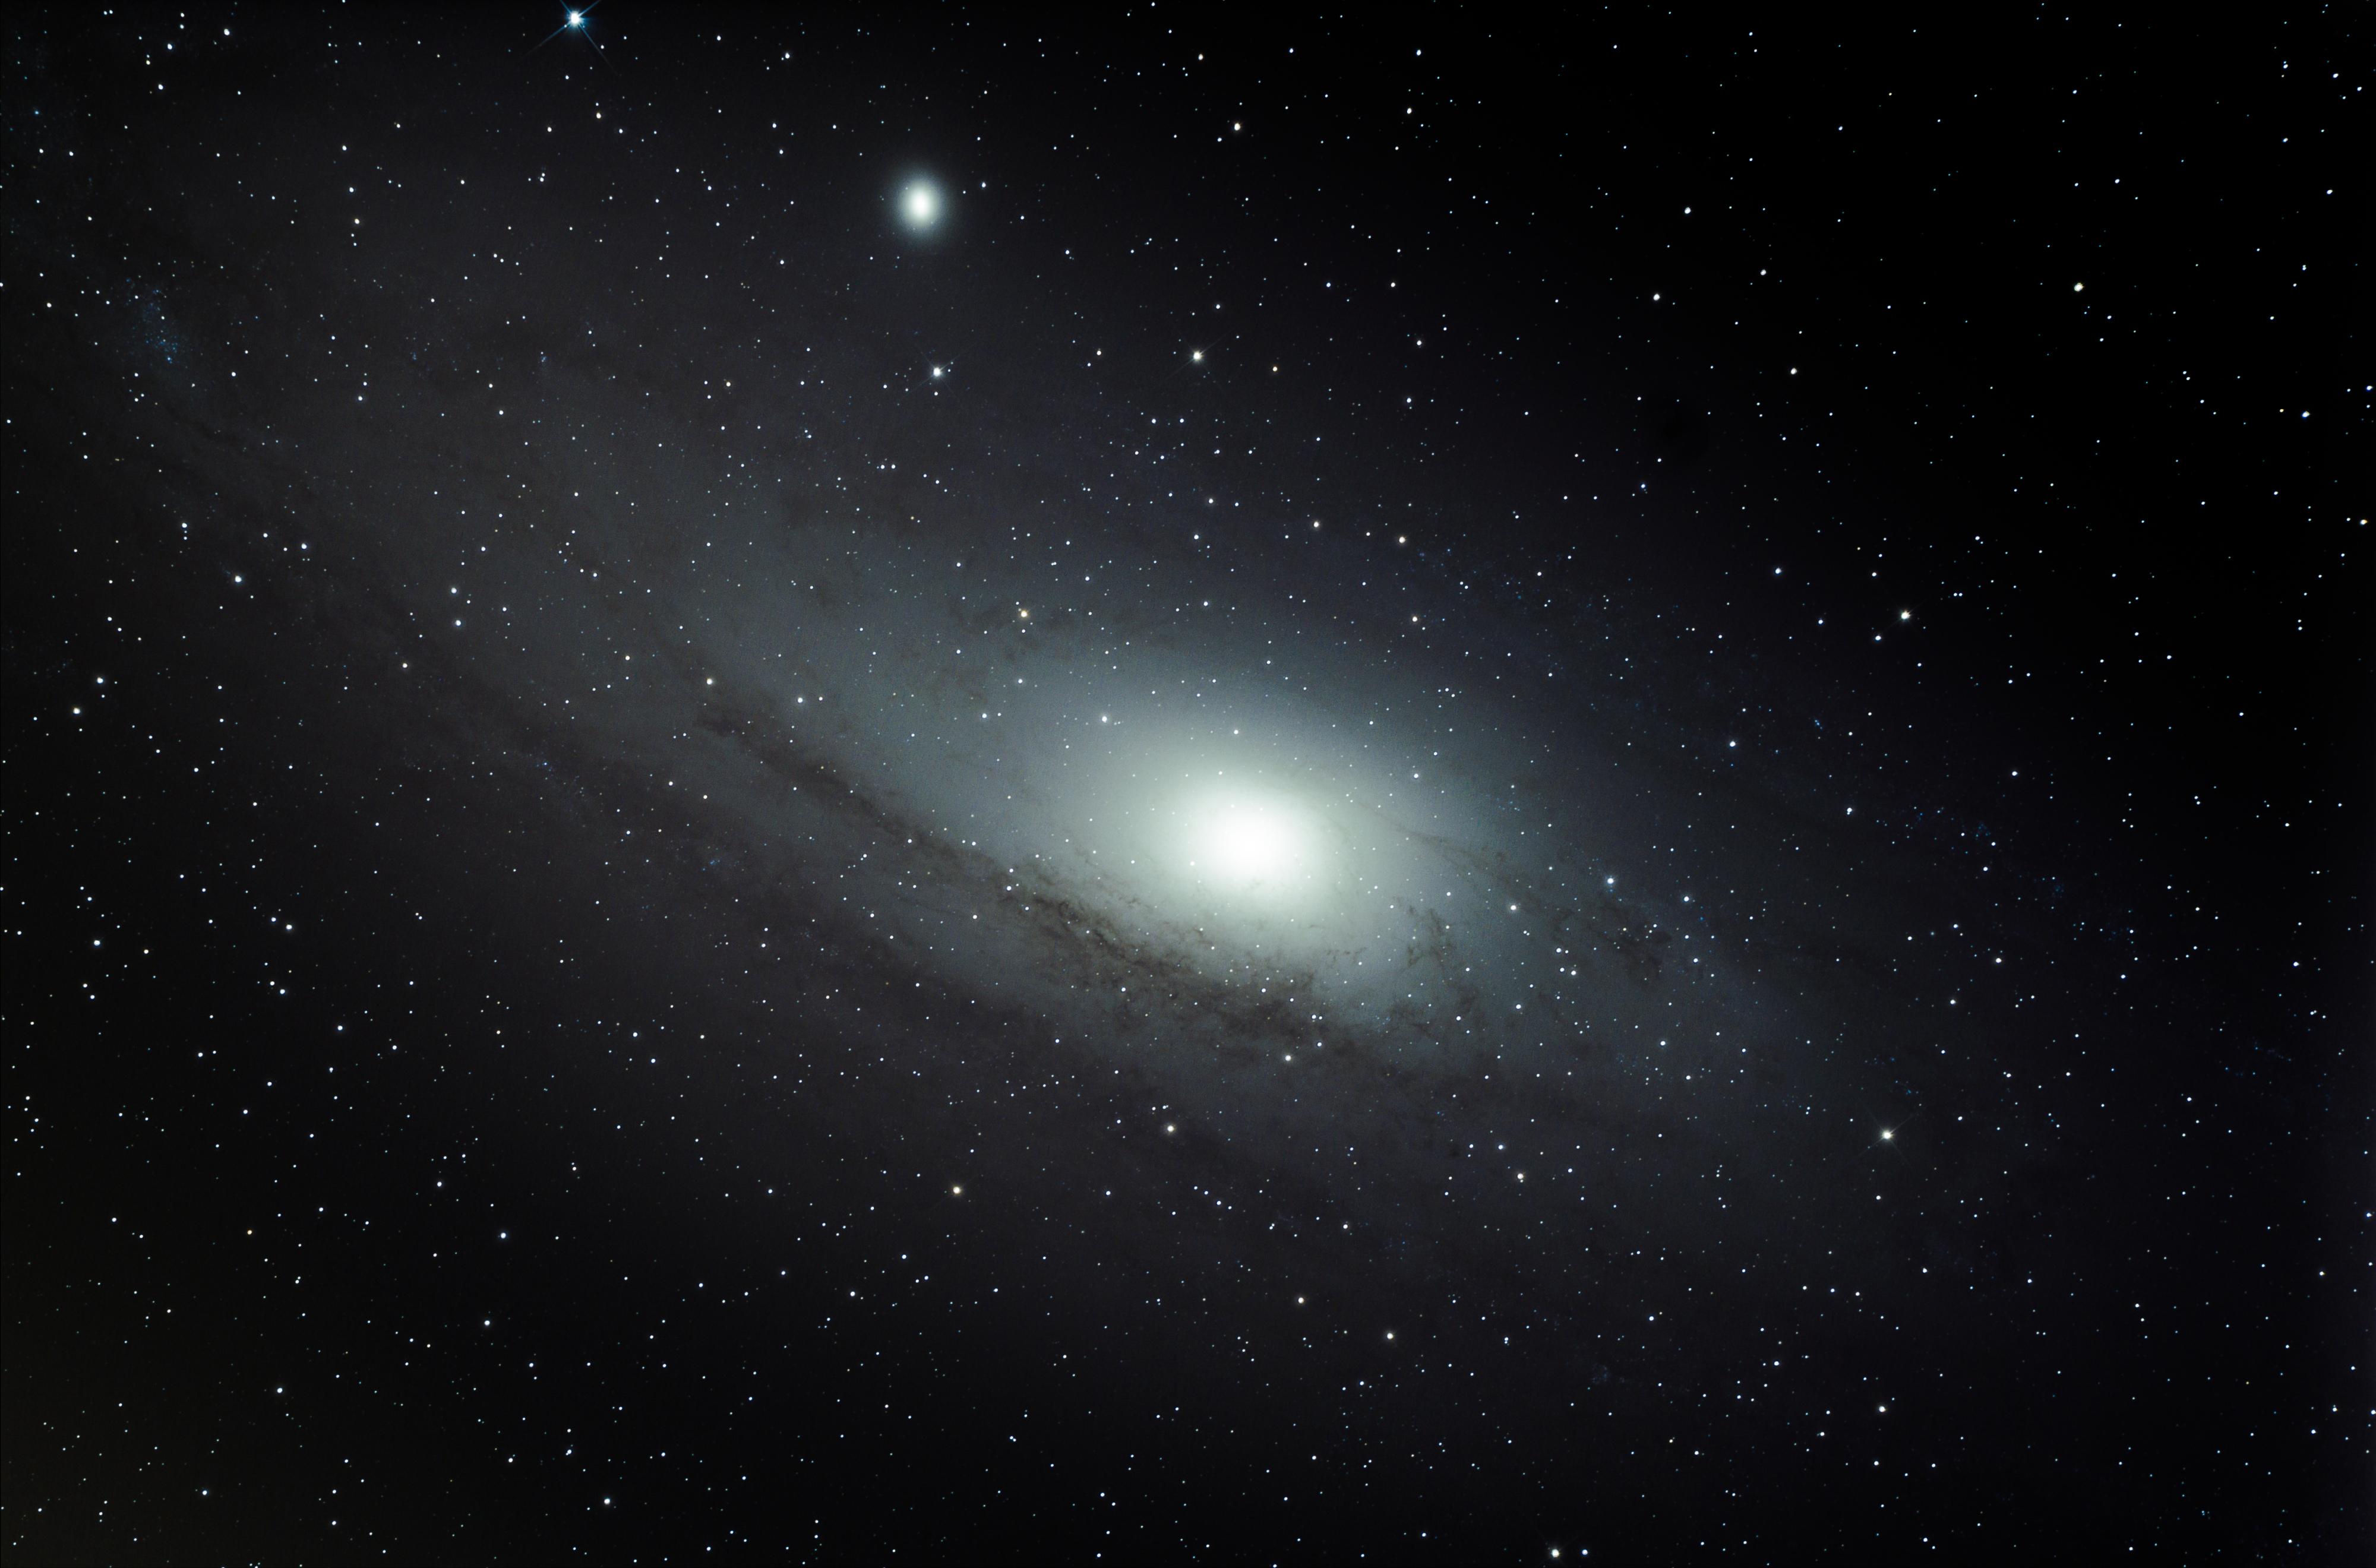 Messier 31 - La Galaxie d'Andromède